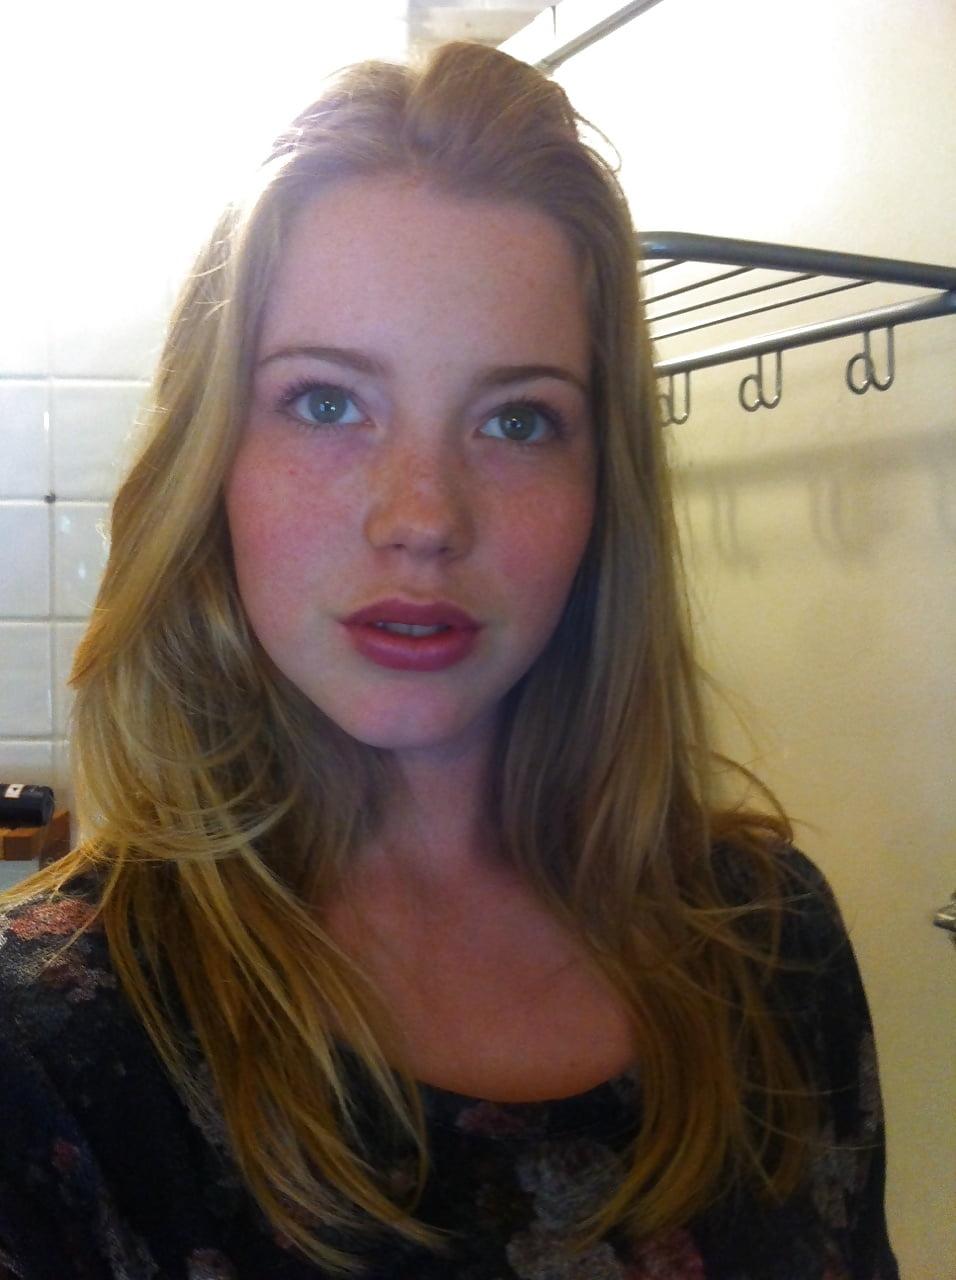 See and Save As blondes teen mit dicken titten macht fotos